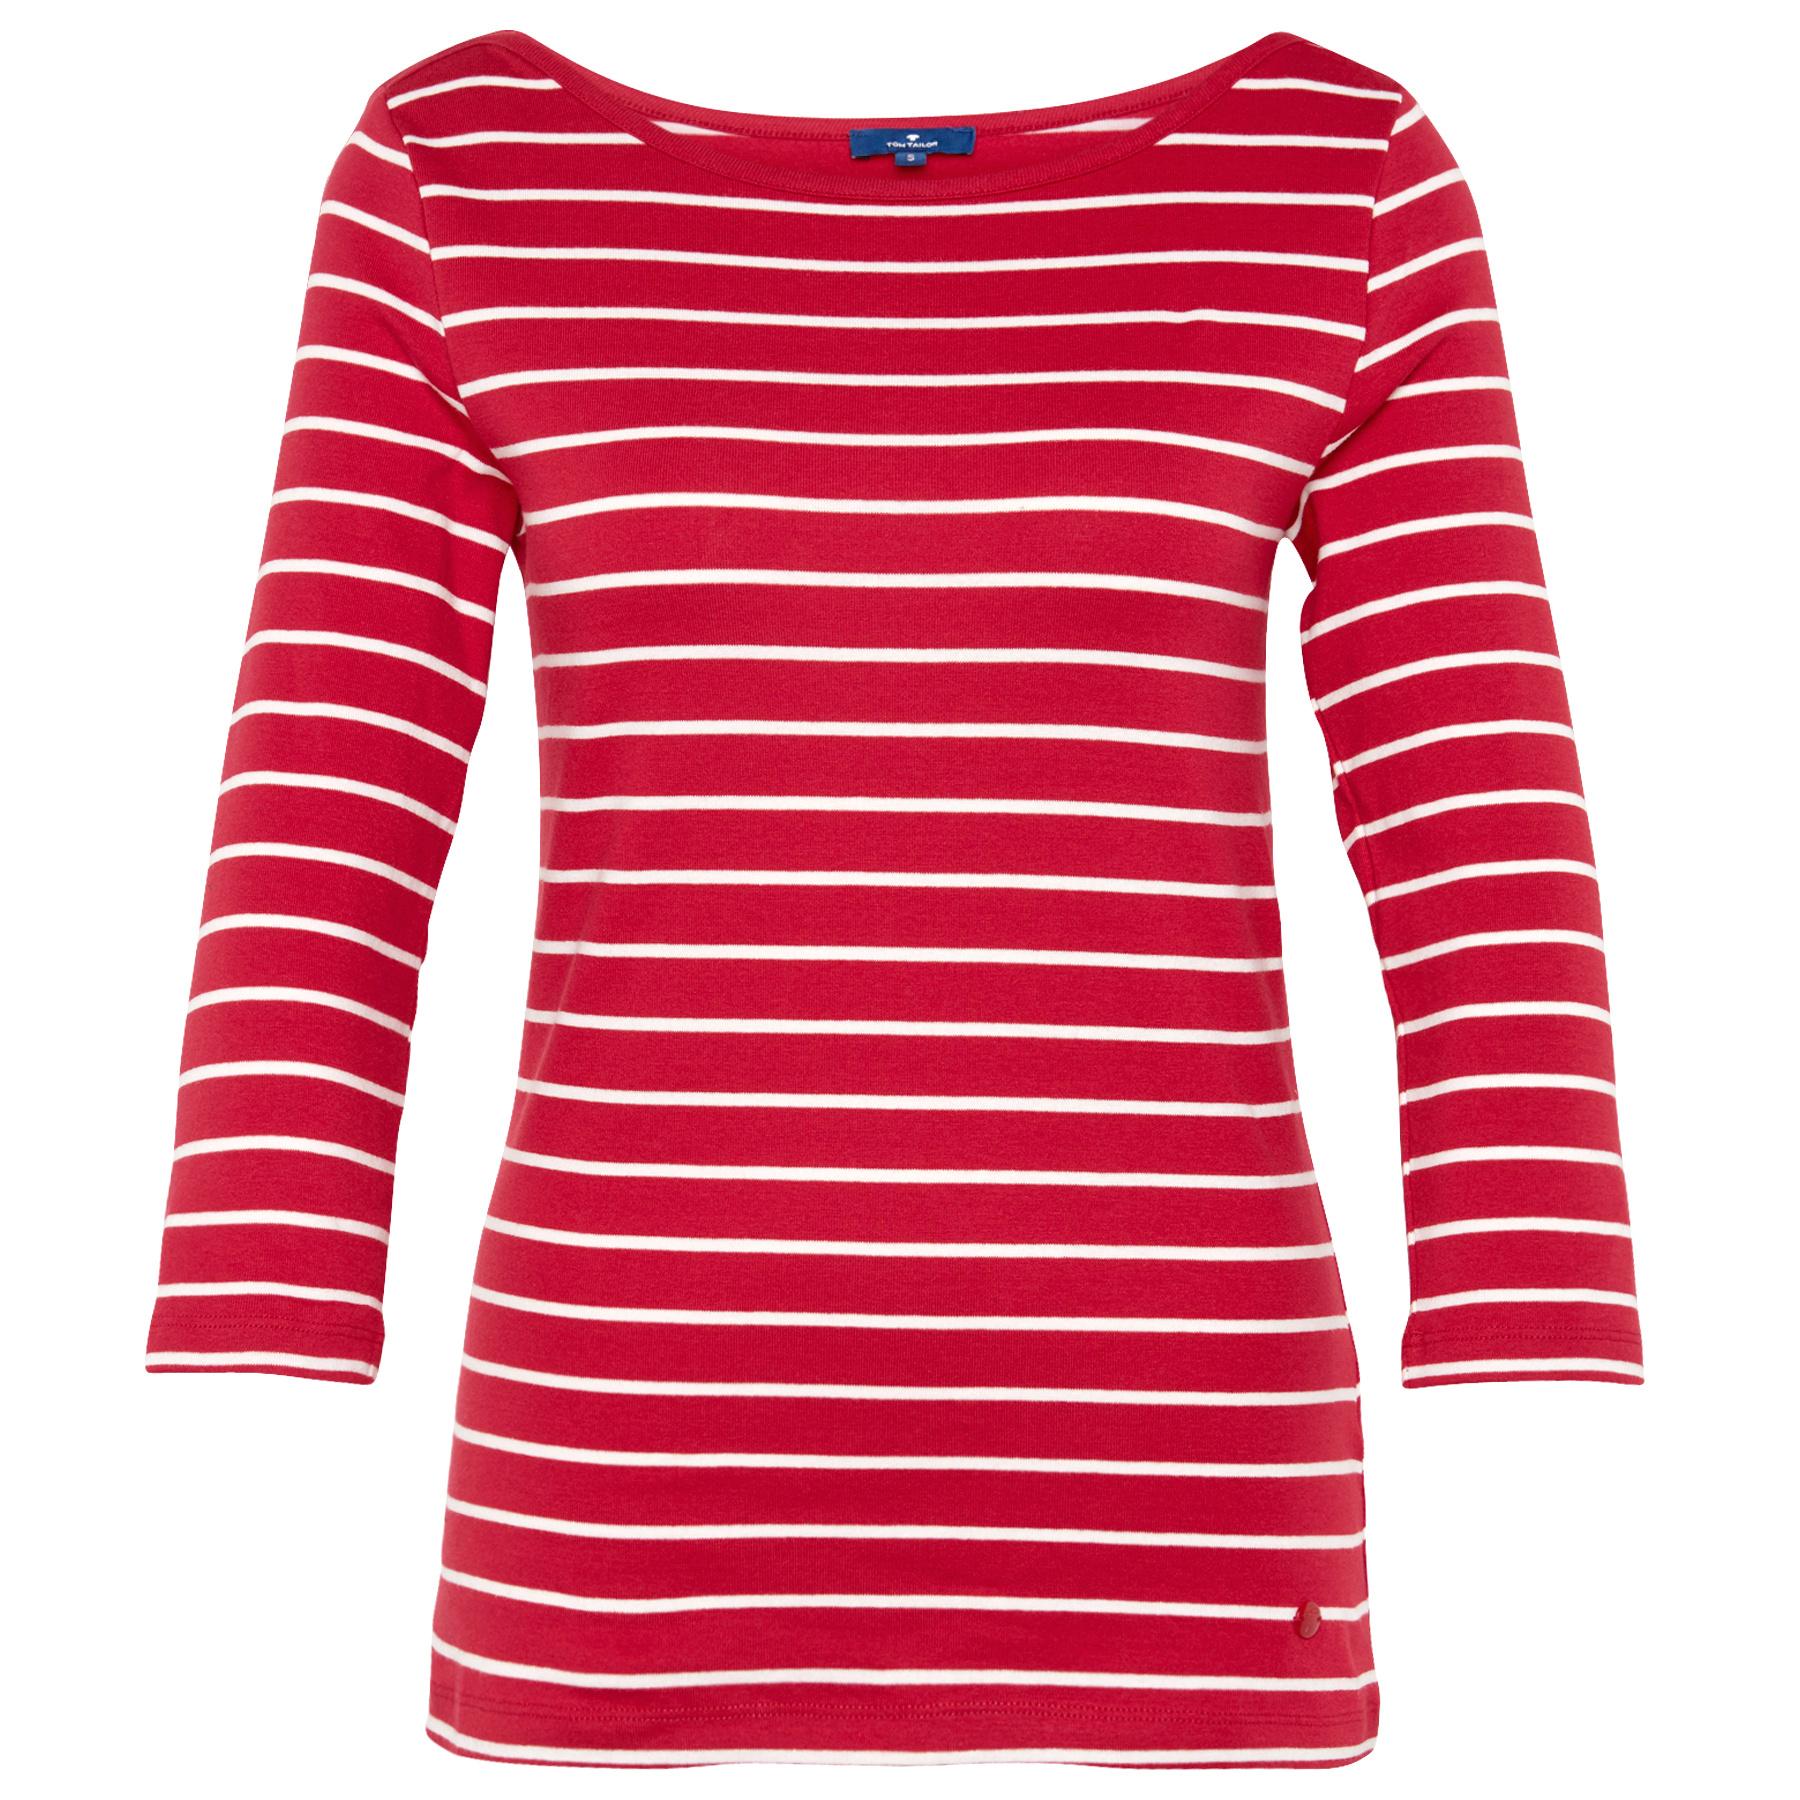 TTW_NOS_t-shirt-red-stripes_10384130970_19,99eur